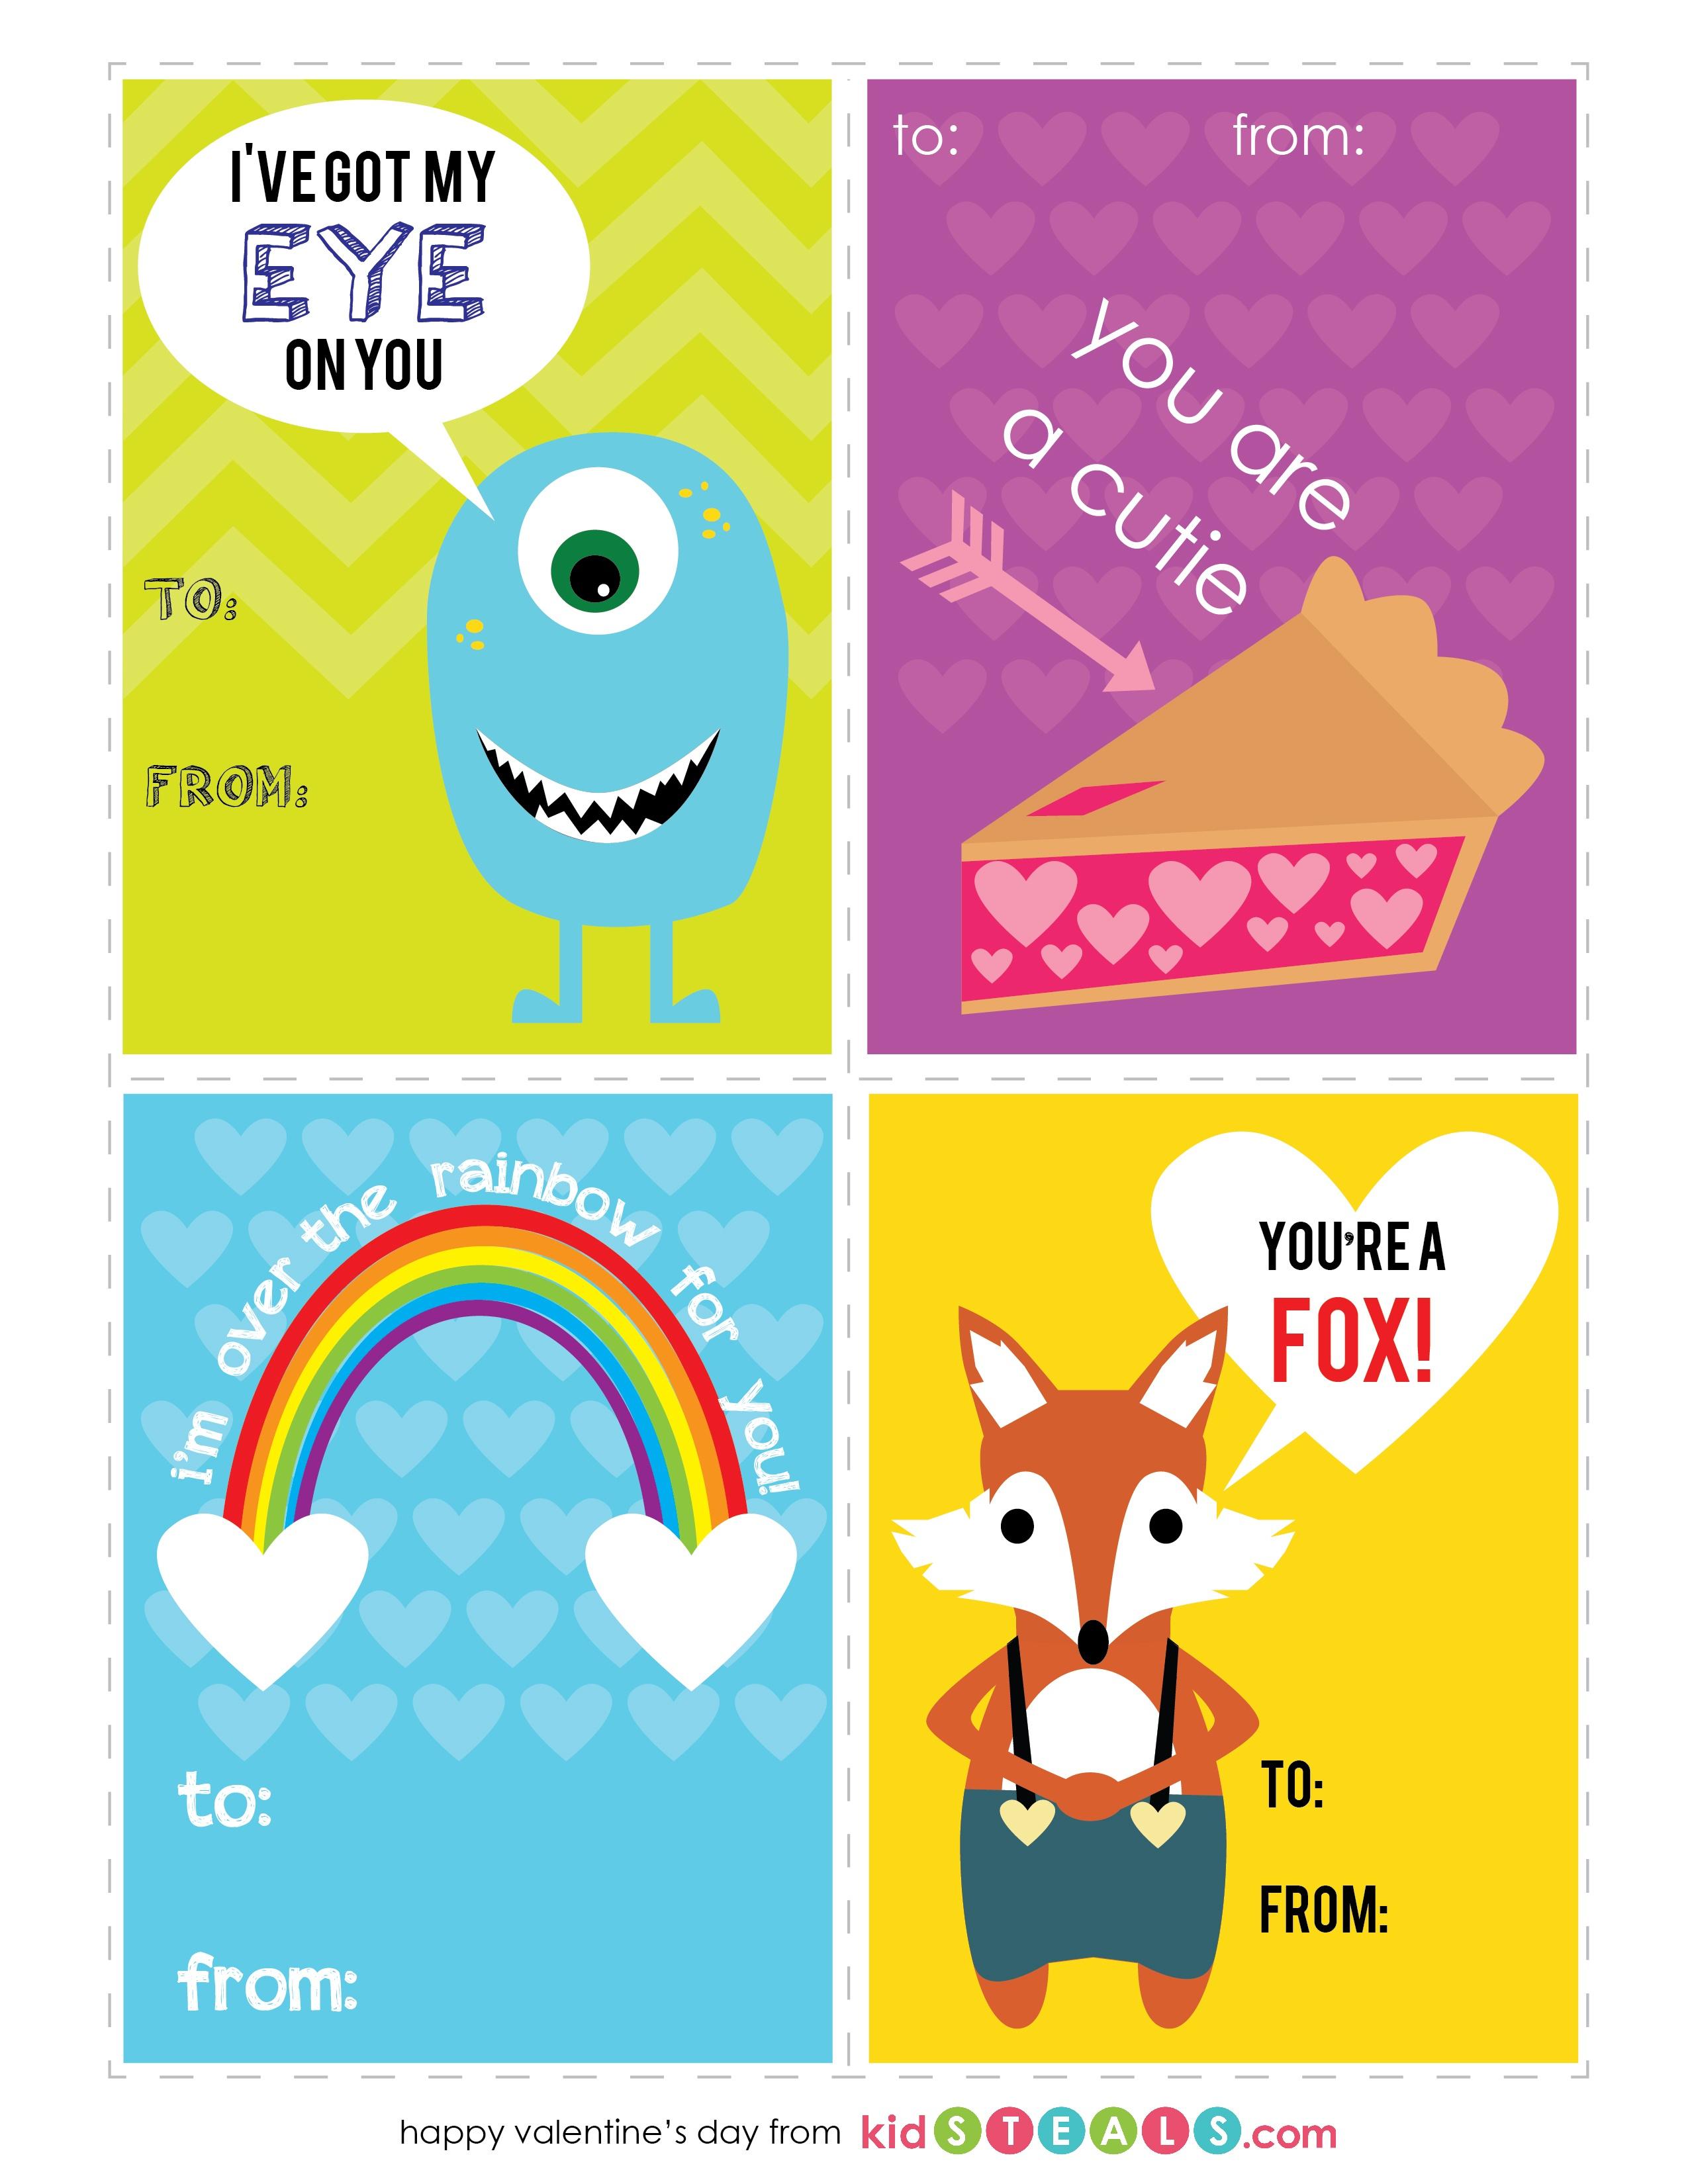 Free Valentines Printables For Kids | Kidsteals - Free Printable Valentines For Kids